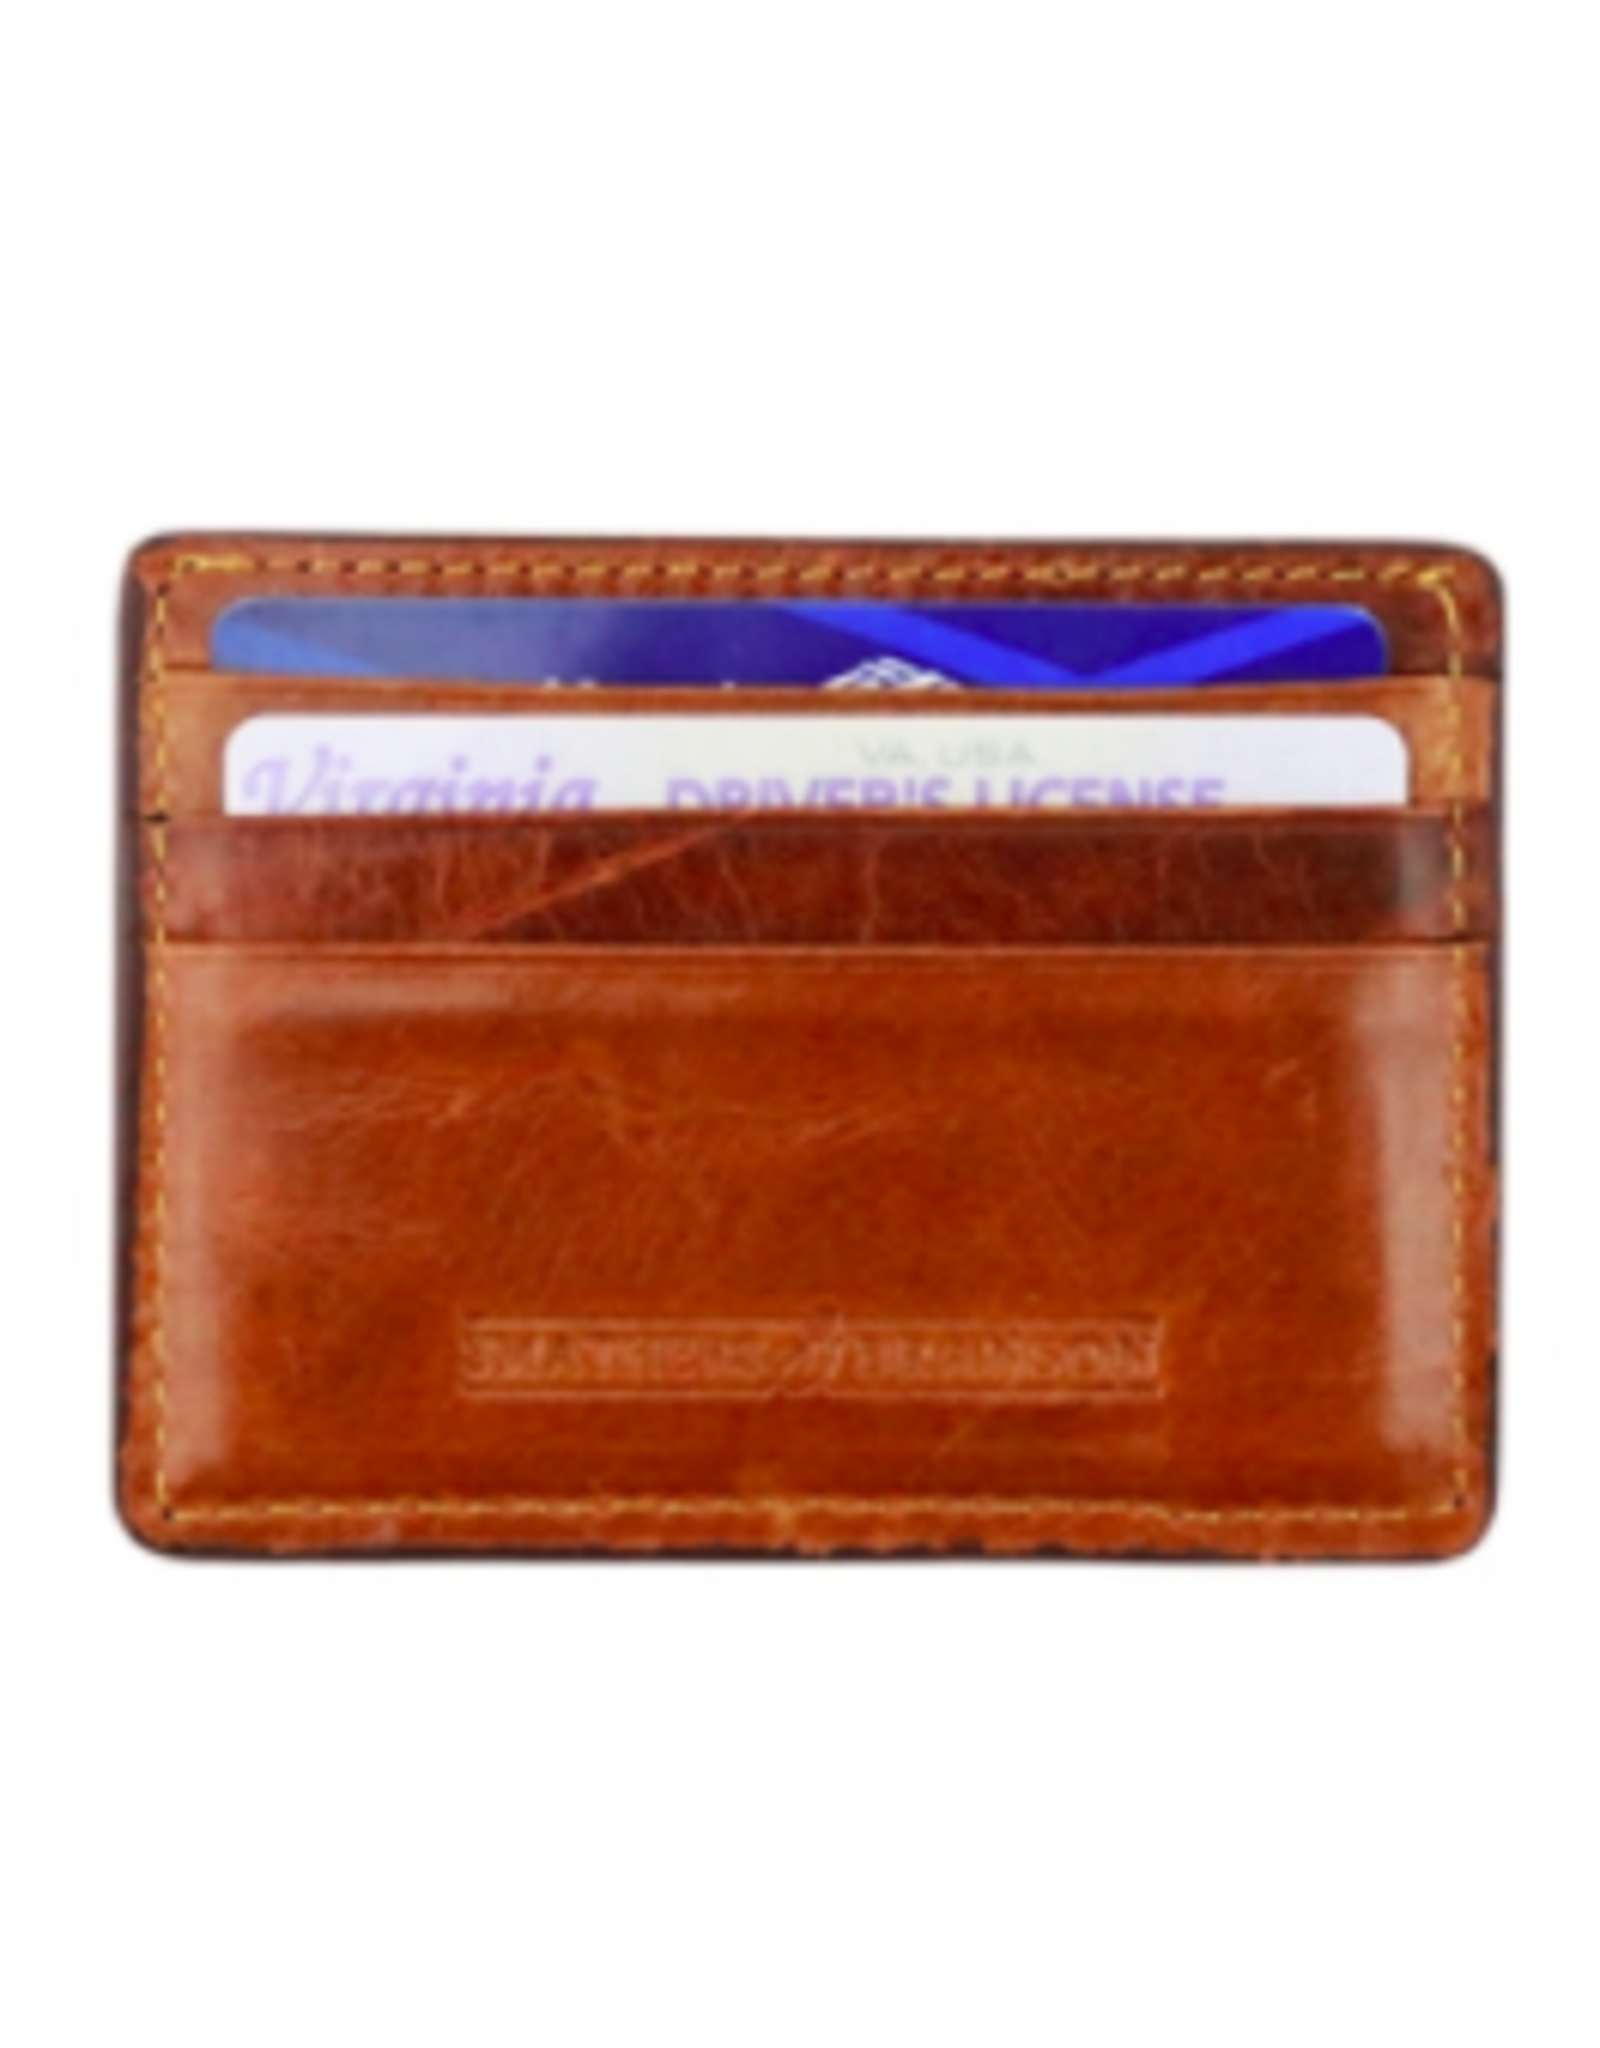 Smathers & Branson Golden Card Wallet